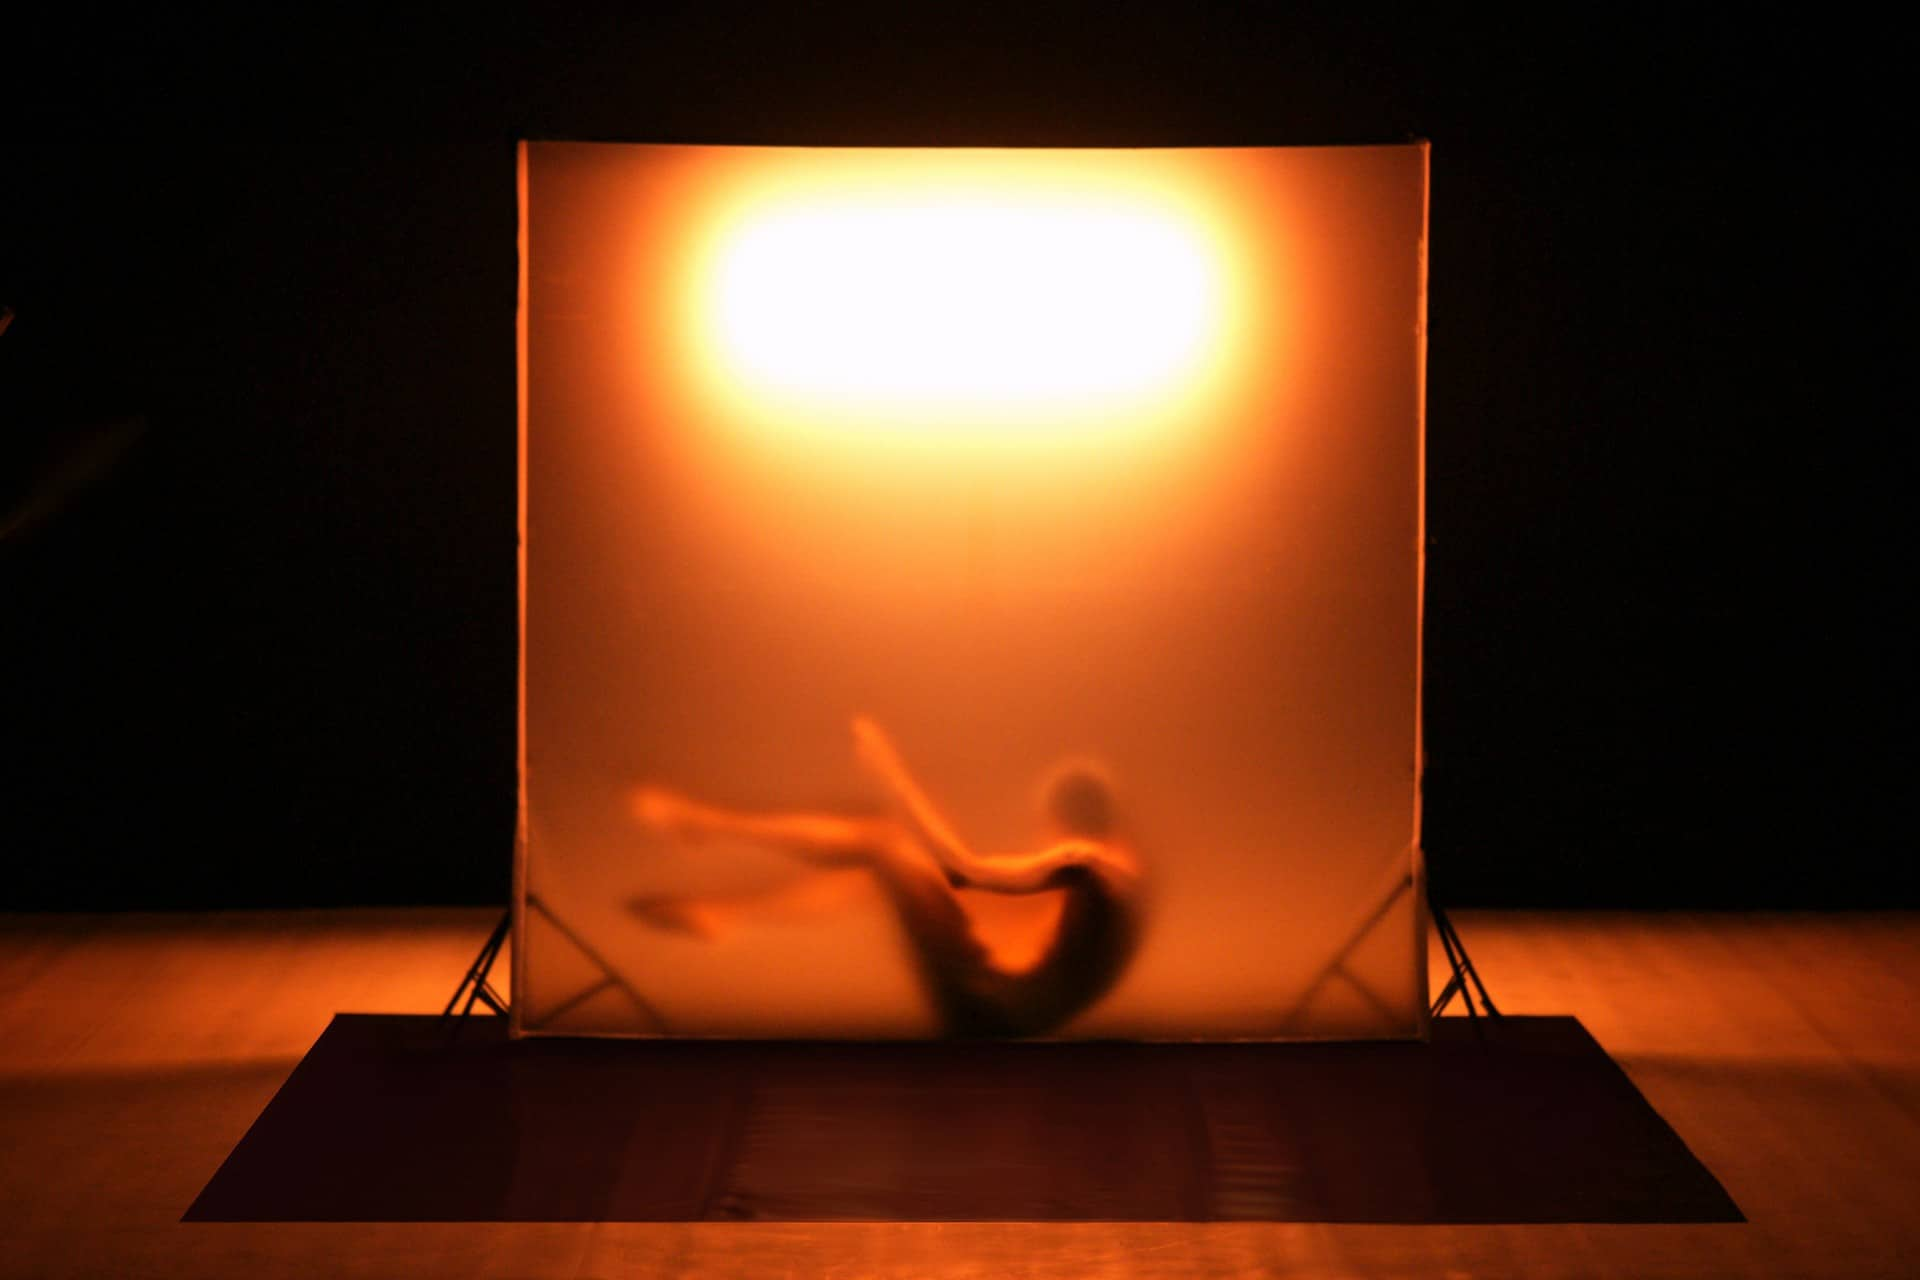 Nicola Galli / Mars / TIR-danza / ph Nicola Galli